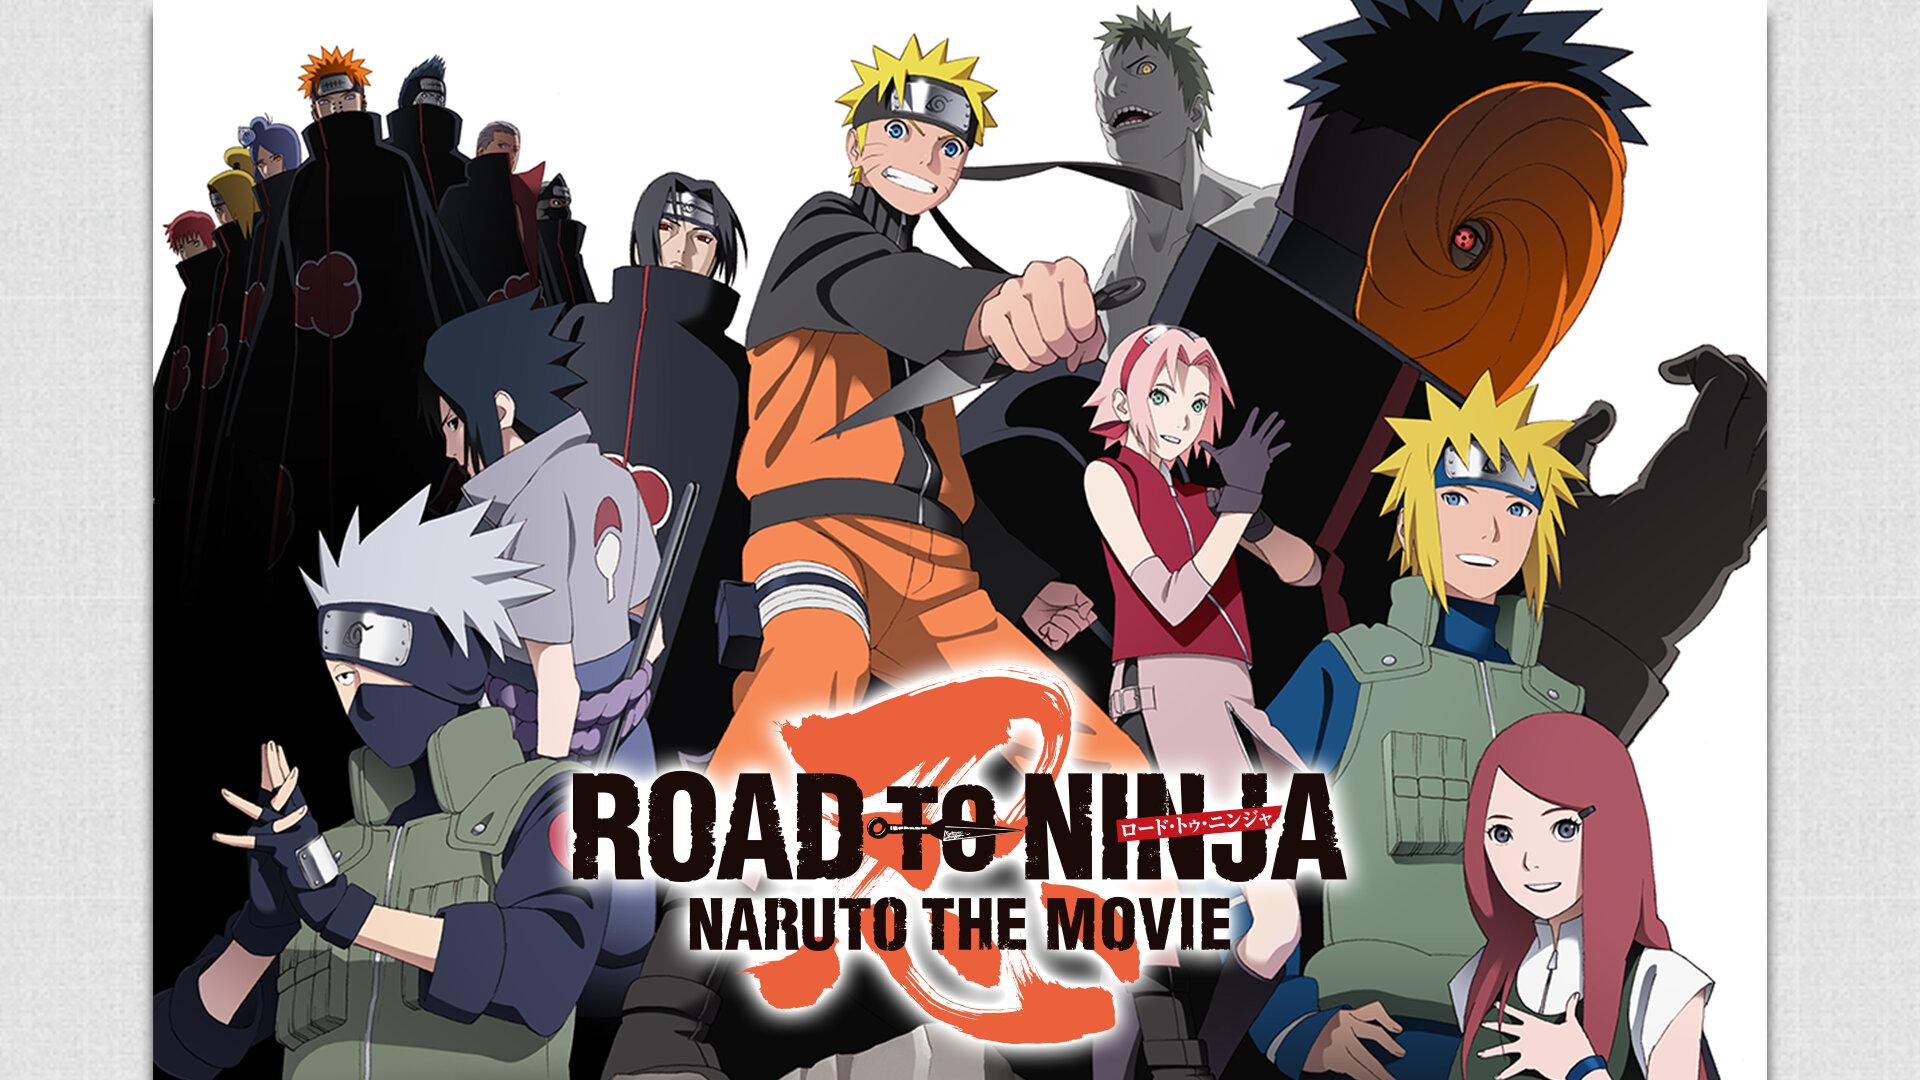 ROAD TO NINJA -NARUTO THE MOVIE-(dアニメストア)